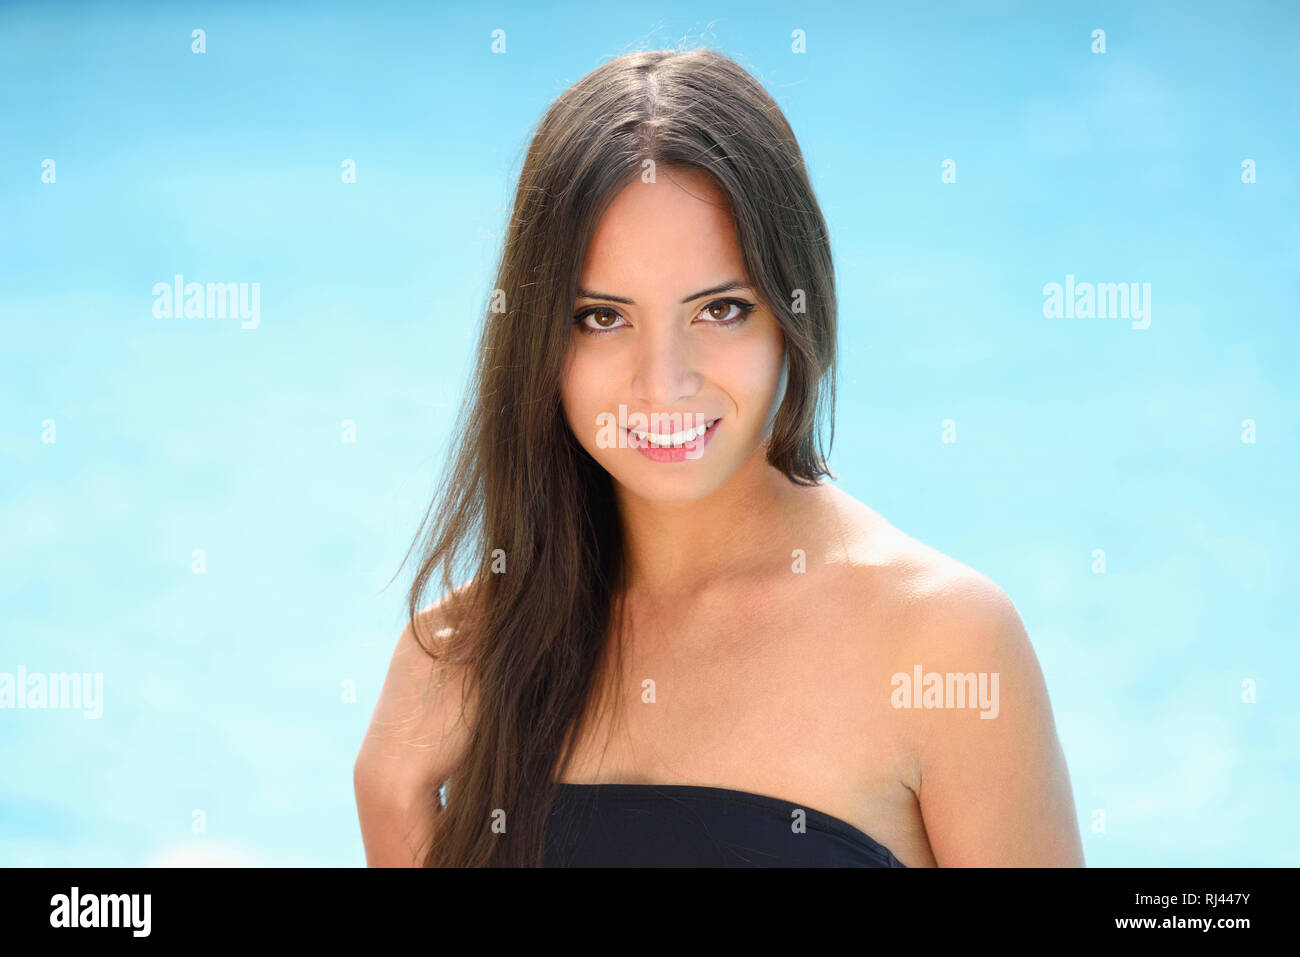 Frau, jung, Halbportrait, Monokini, Freibad, frontal, stehen, Blick Kamera - Stock Image